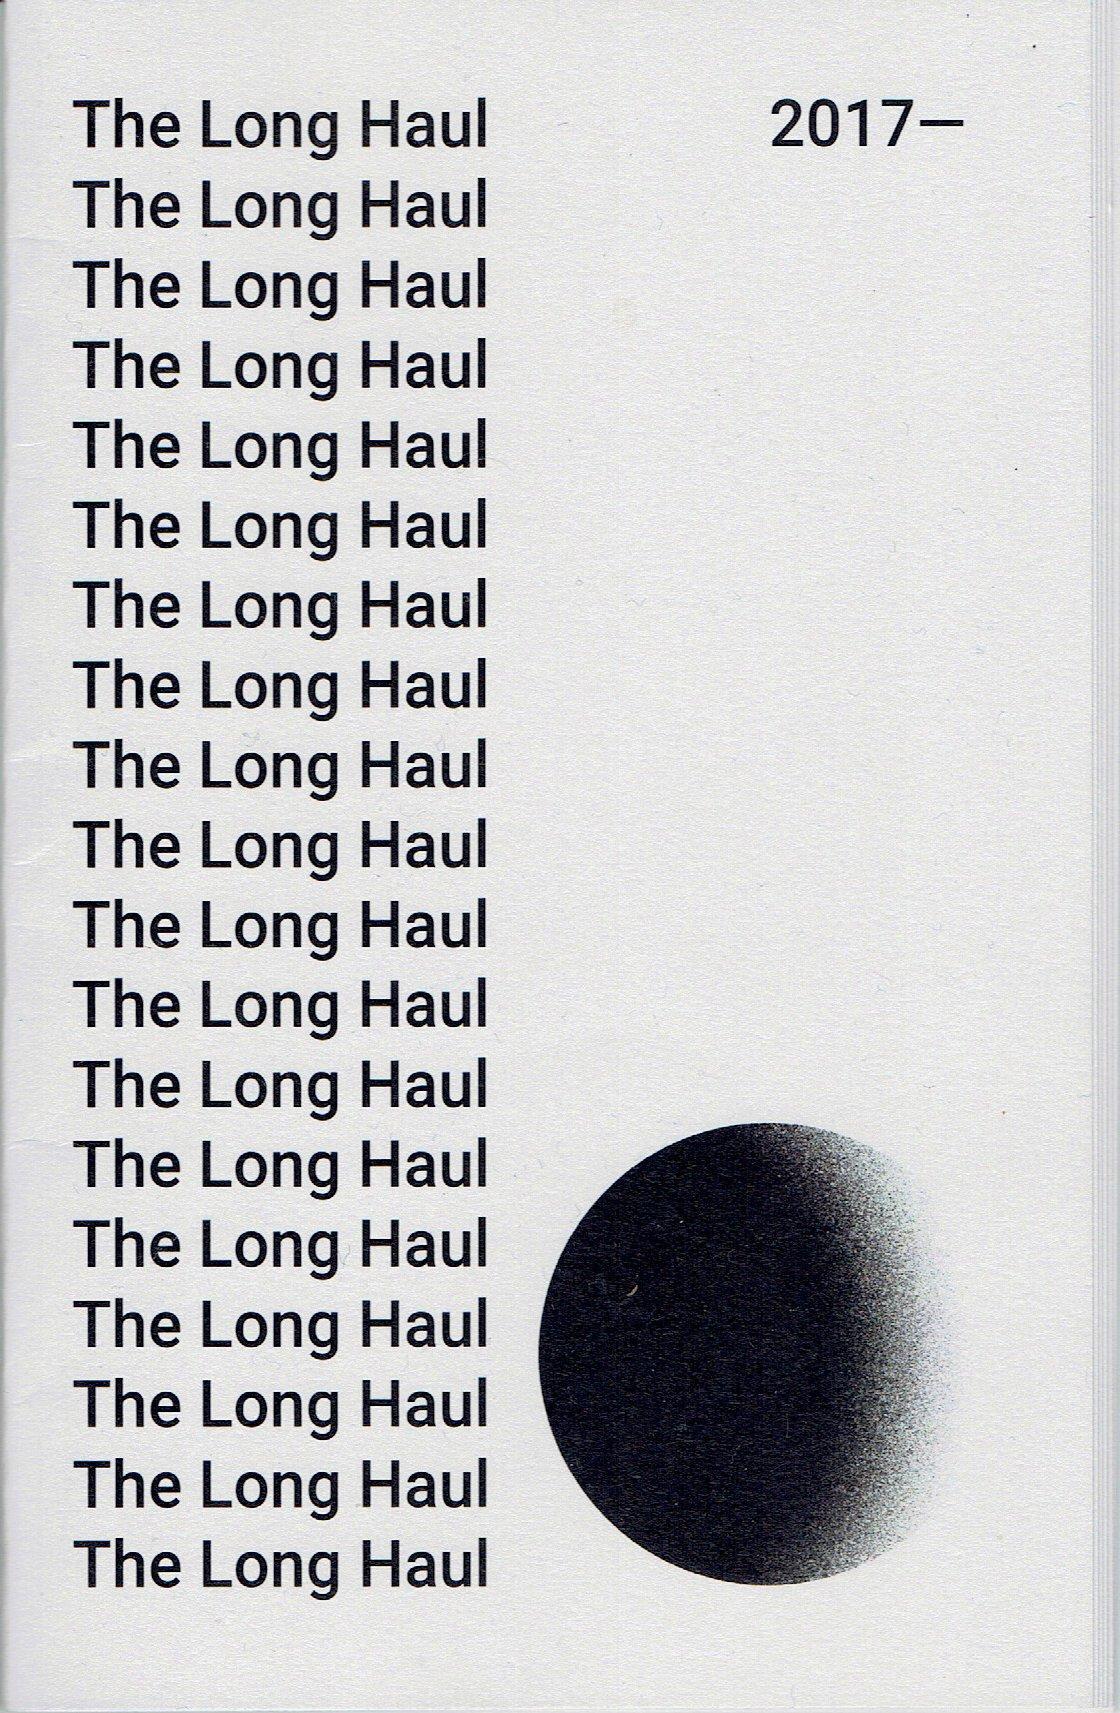 Image of The Long Haul Zine